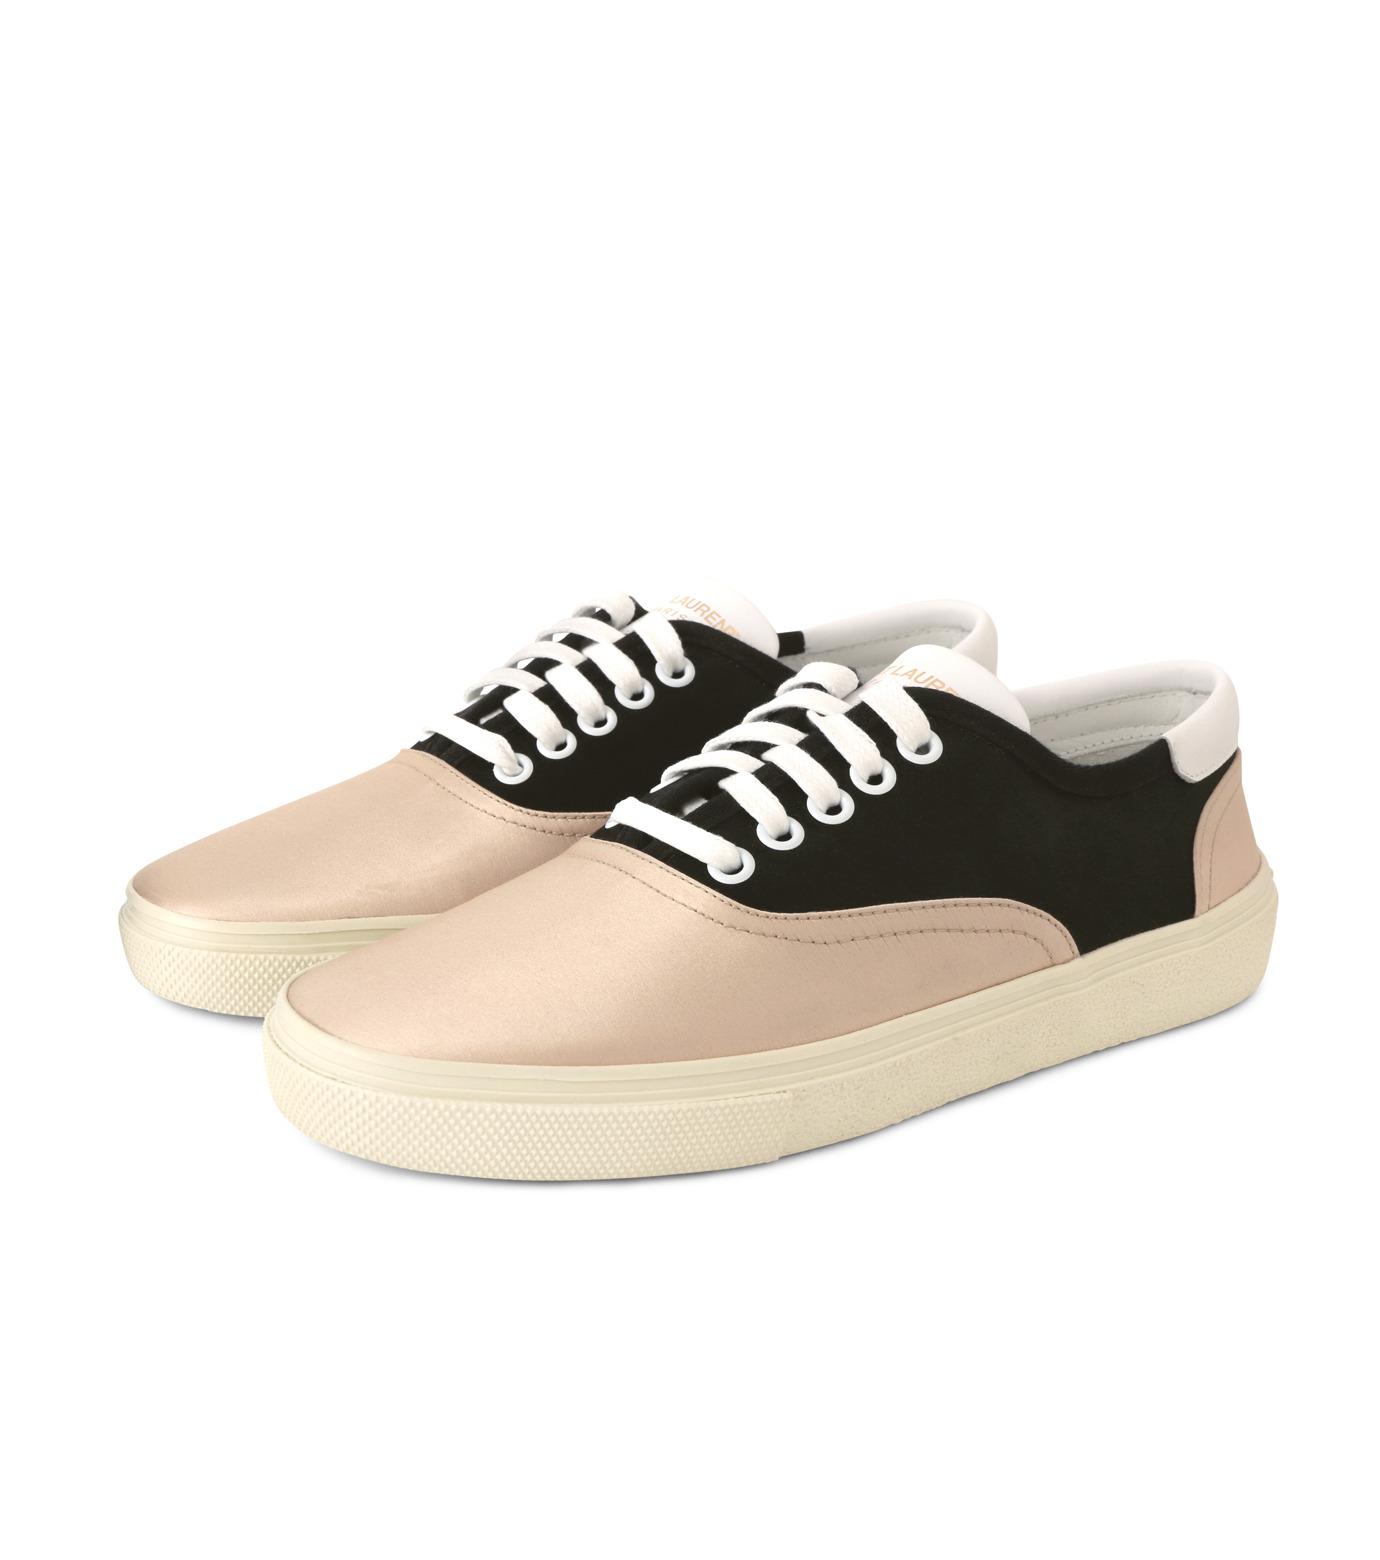 SAINT LAURENT(サンローラン)のSkate Sneaker Lace Up Satin-BEIGE(スニーカー/sneaker)-345062-F1430-52 拡大詳細画像3